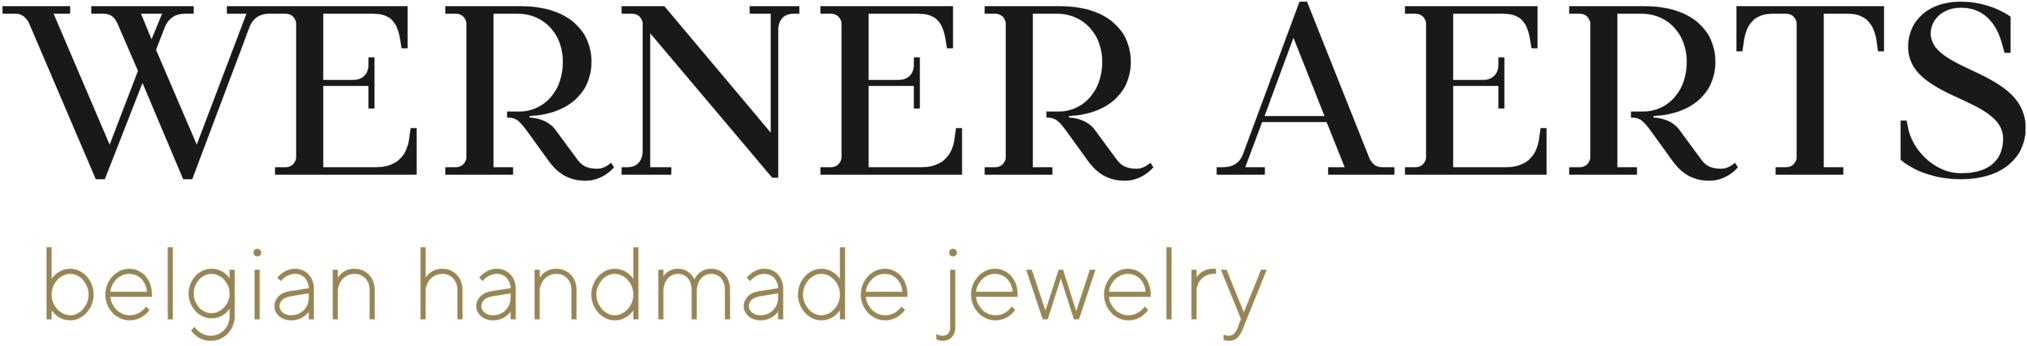 Werner Aerts: Belgian Handmade Jewelry